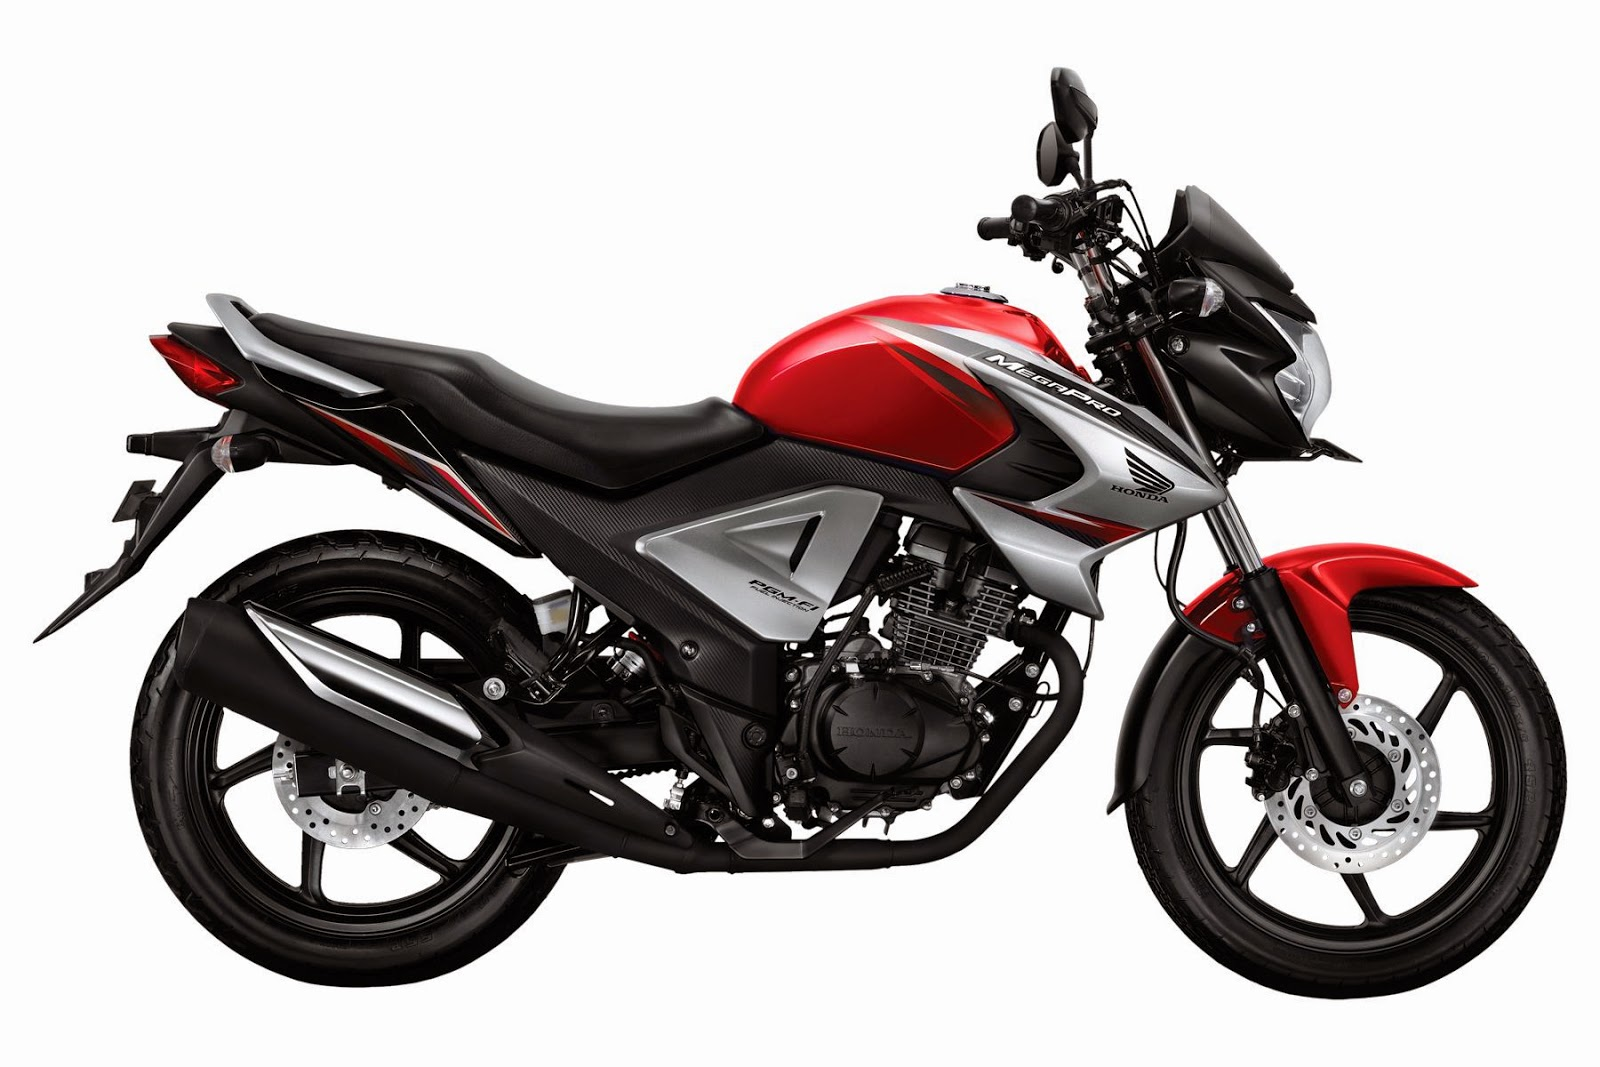 New Honda MegaPro FI renegade Red